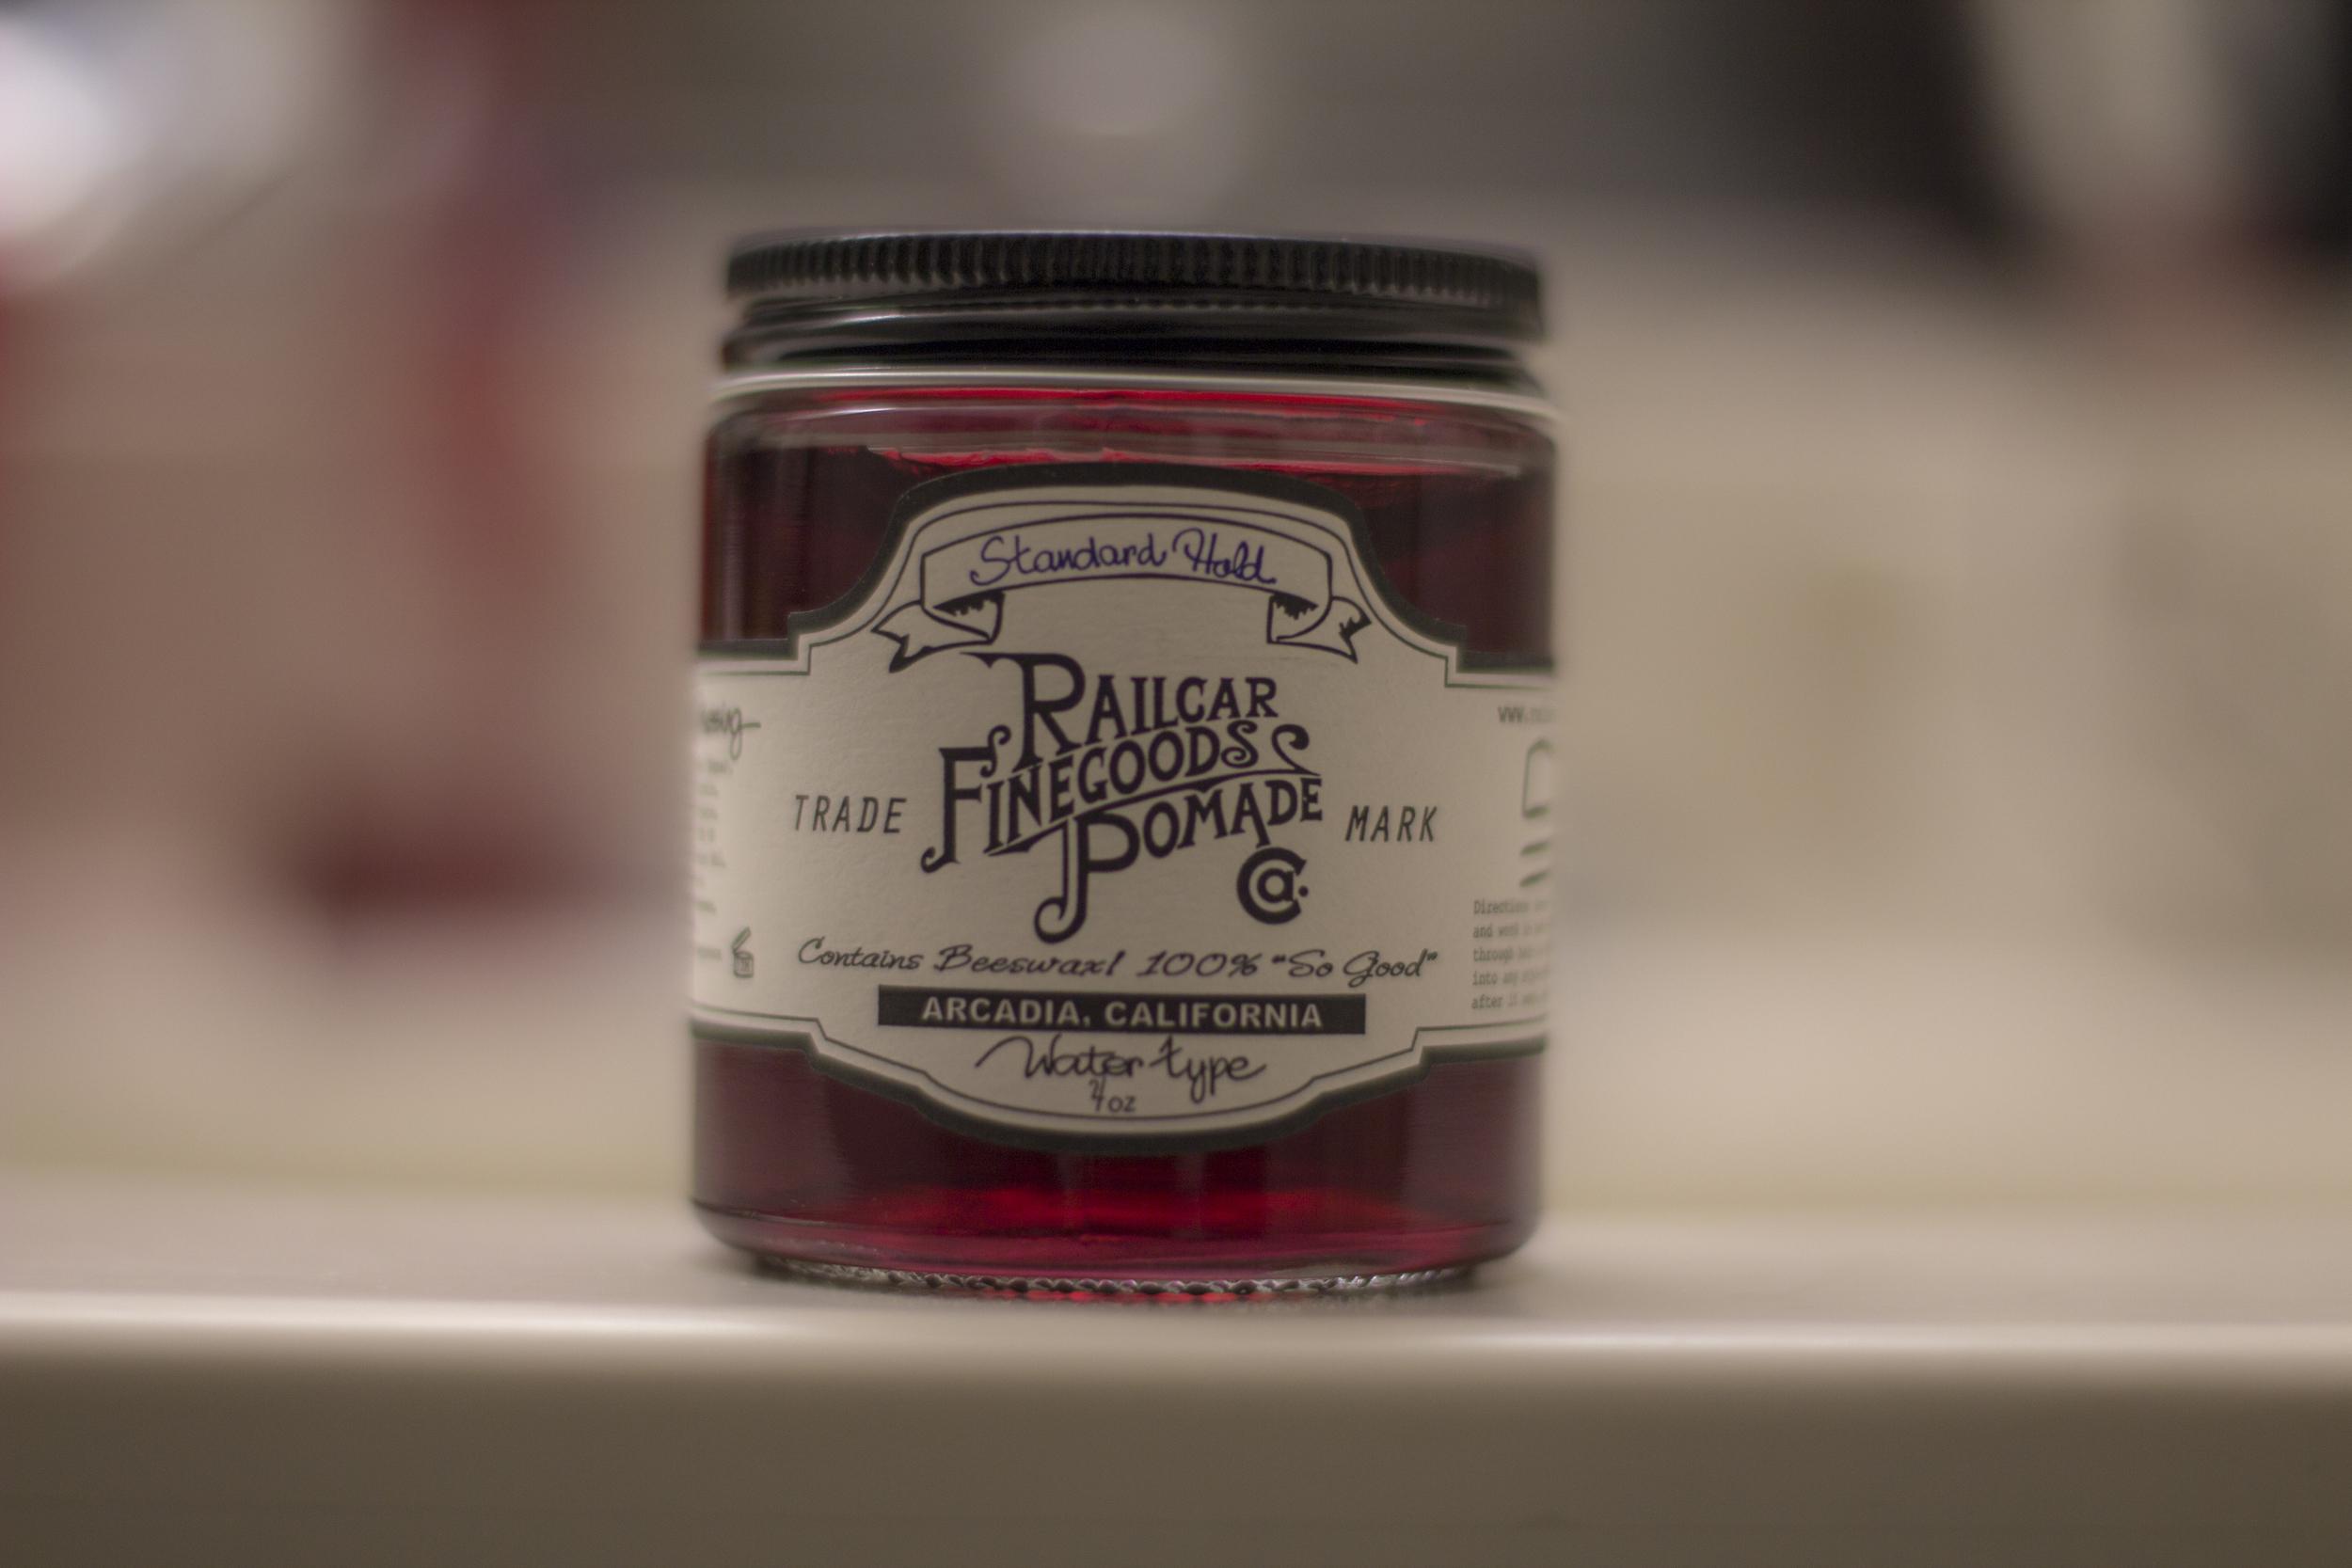 Railcar Finegoods Pomade jar